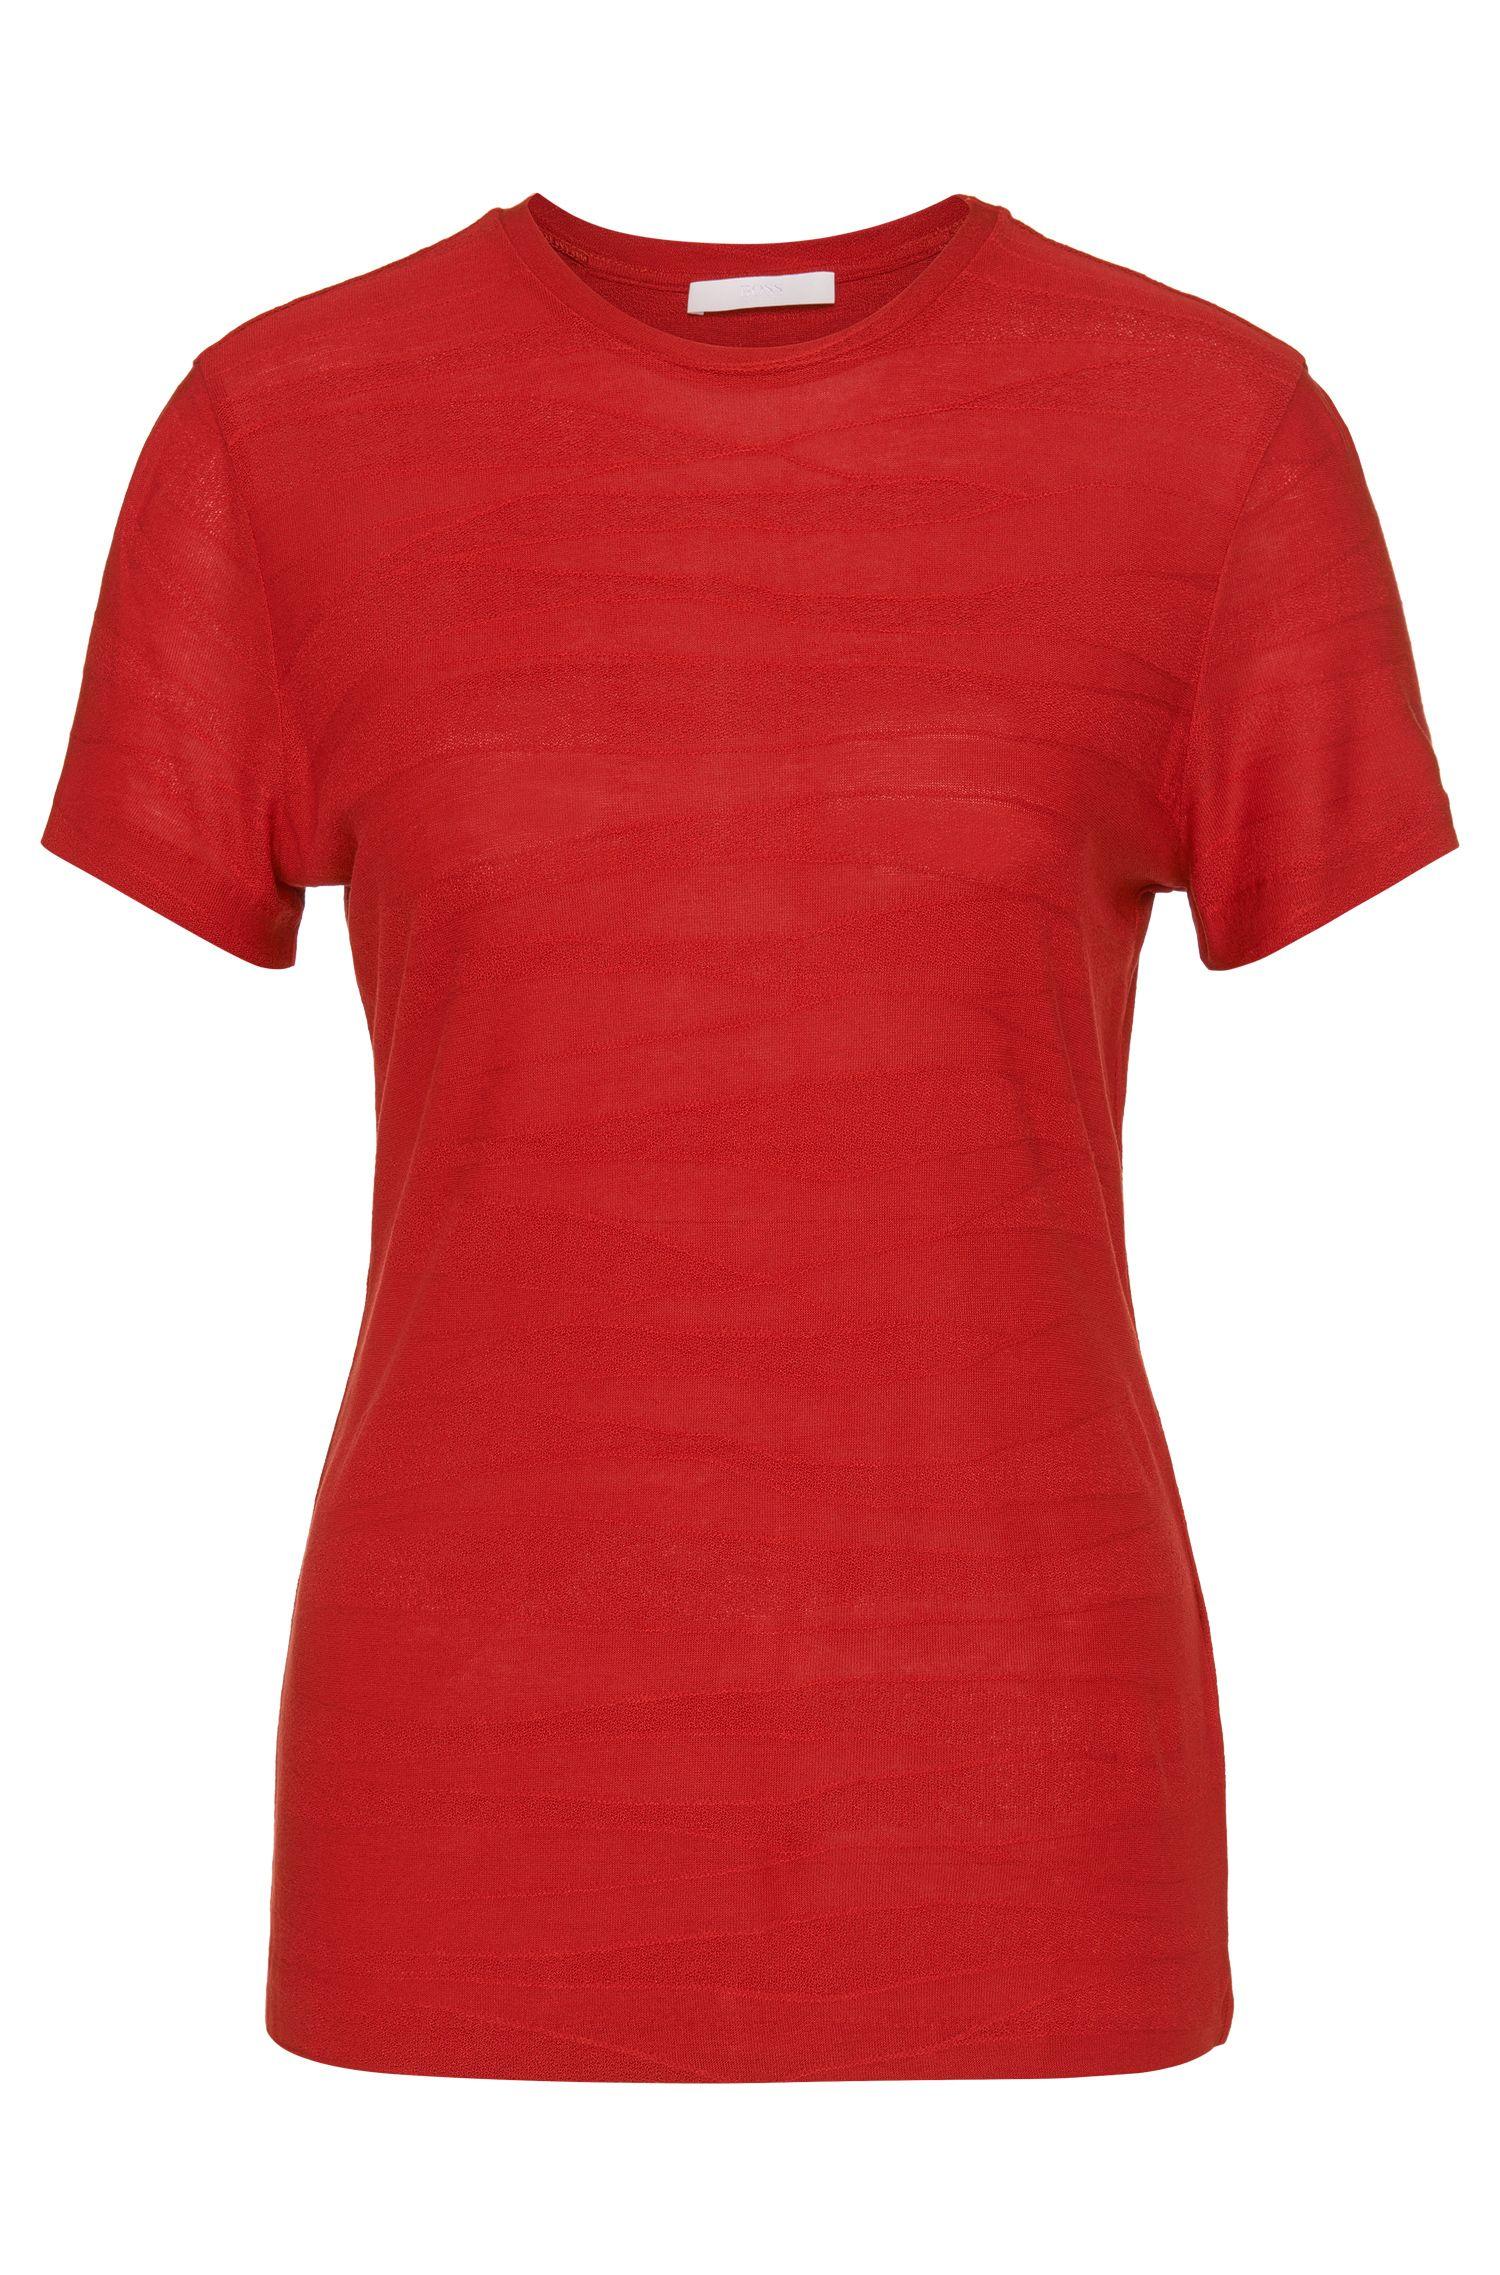 T-Shirt aus Viskose im Struktur-Mix: 'Edonesa'